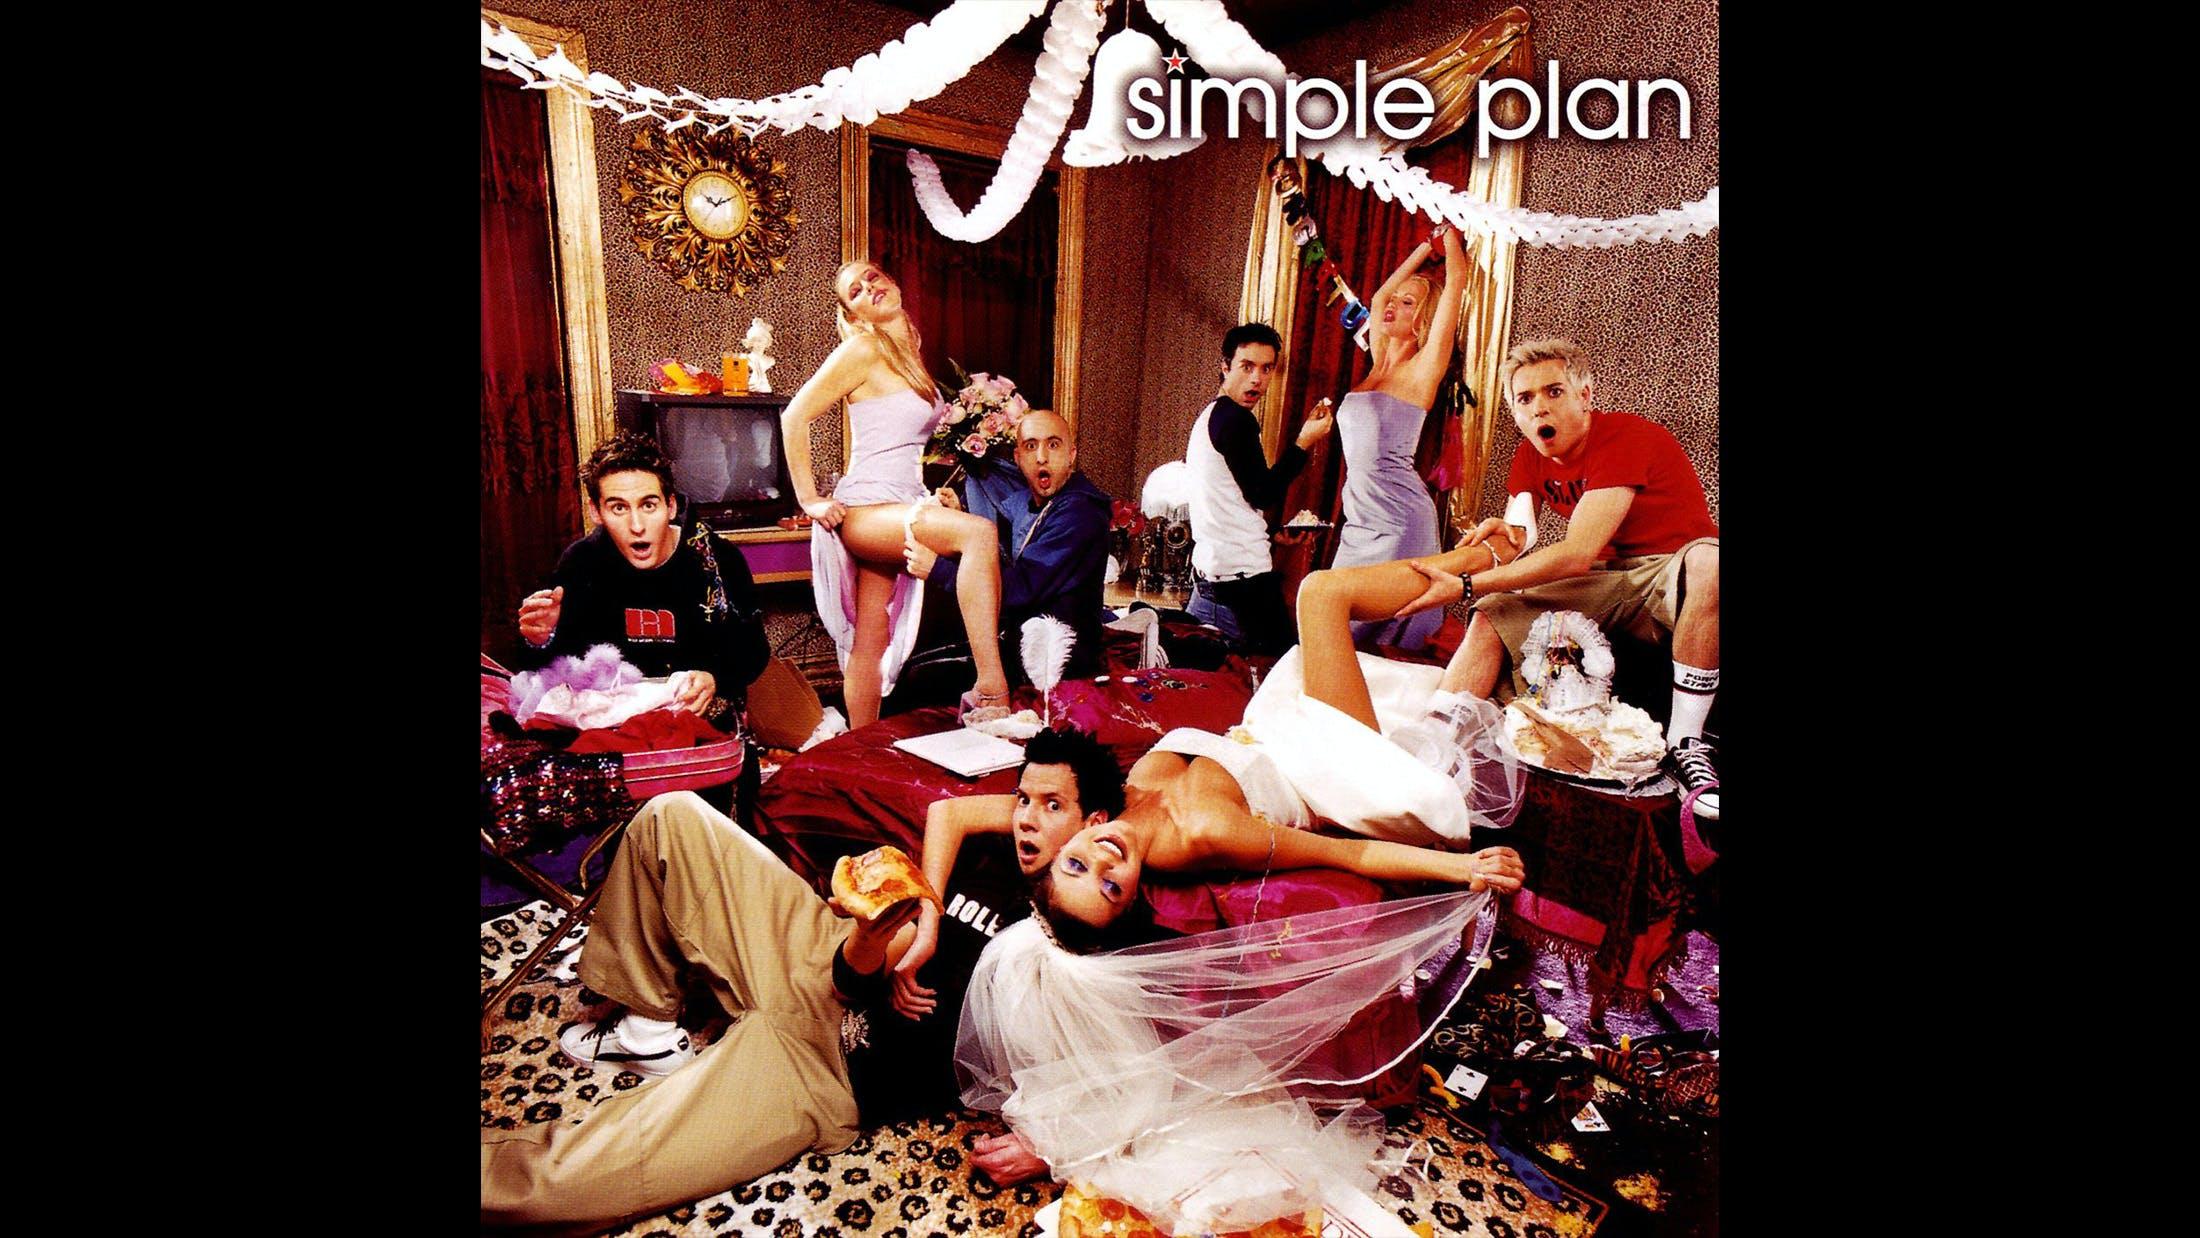 26. Simple Plan - No Pads, No Helmets... Just Balls (2002)